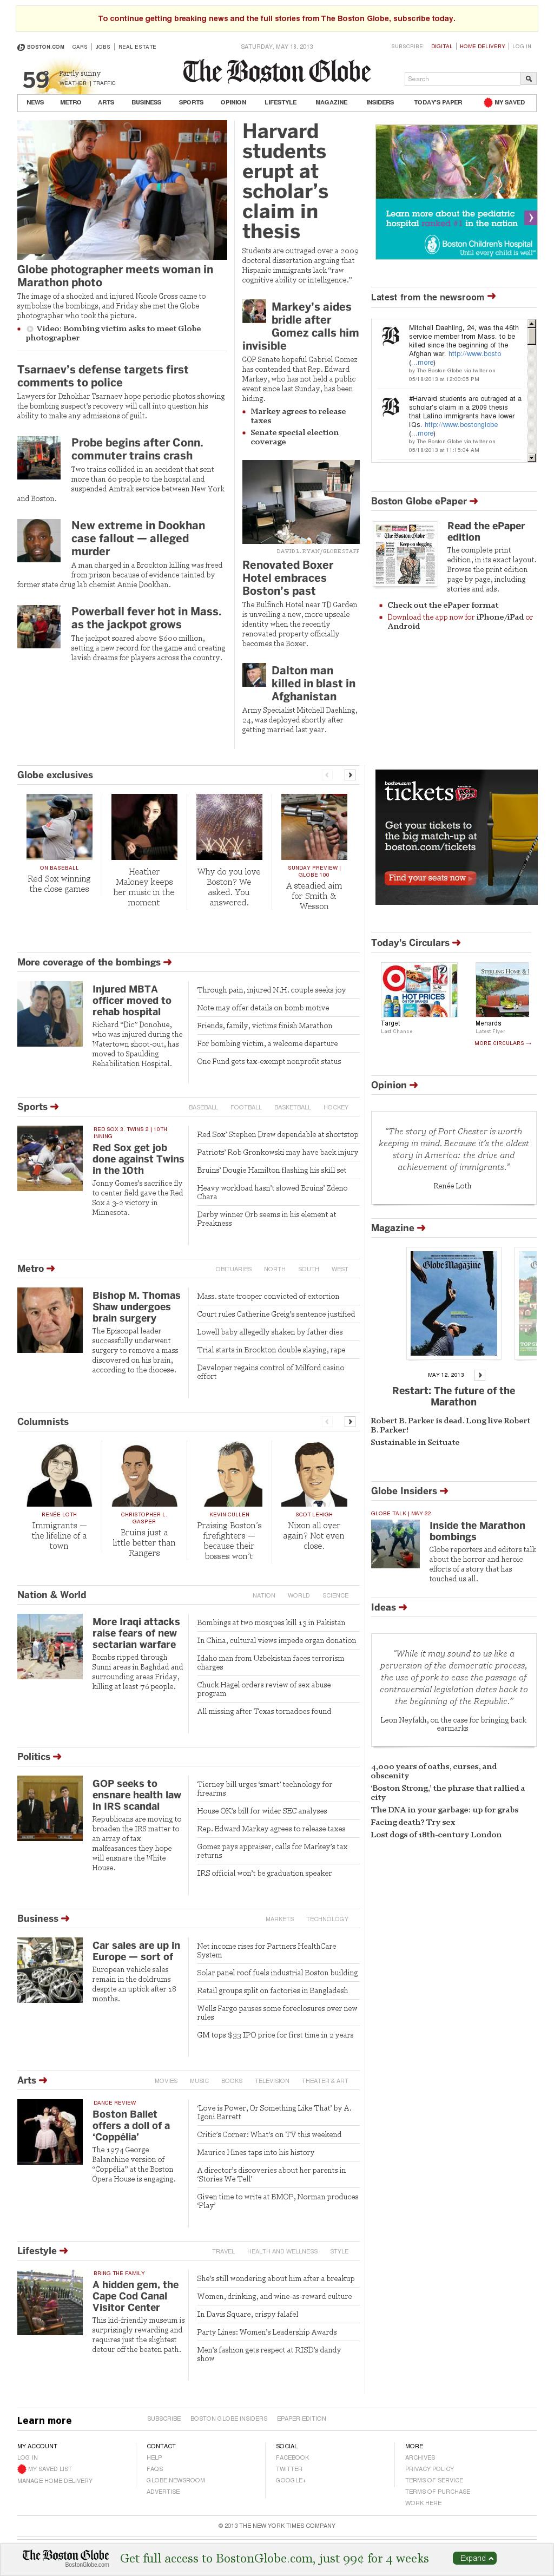 The Boston Globe at Saturday May 18, 2013, 1:02 p.m. UTC